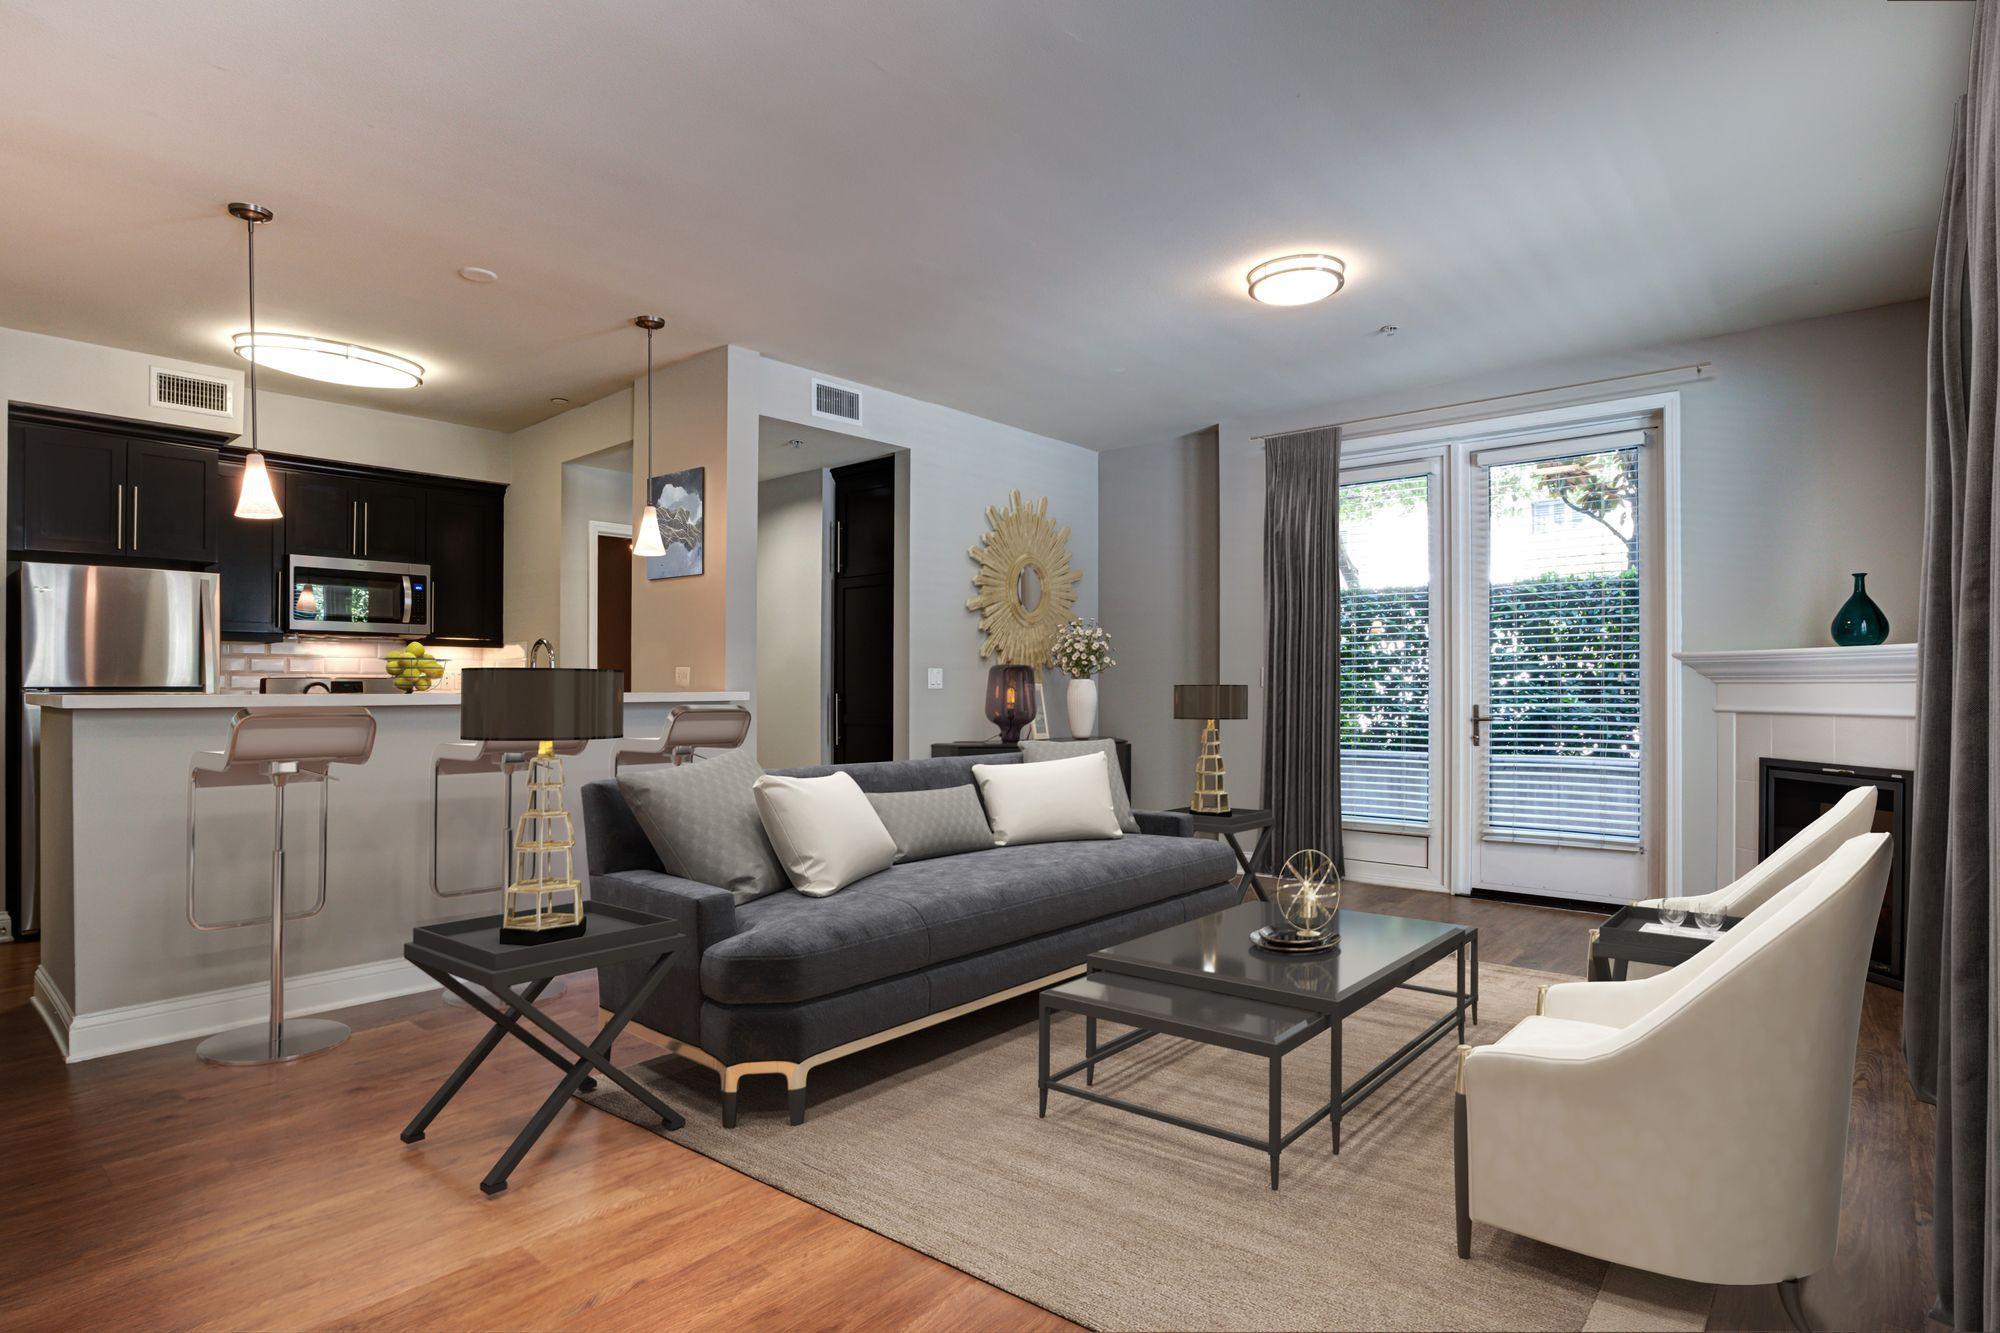 Apartments Near Los Angeles La Belle At Hollywood Tower for Los Angeles Students in Los Angeles, CA